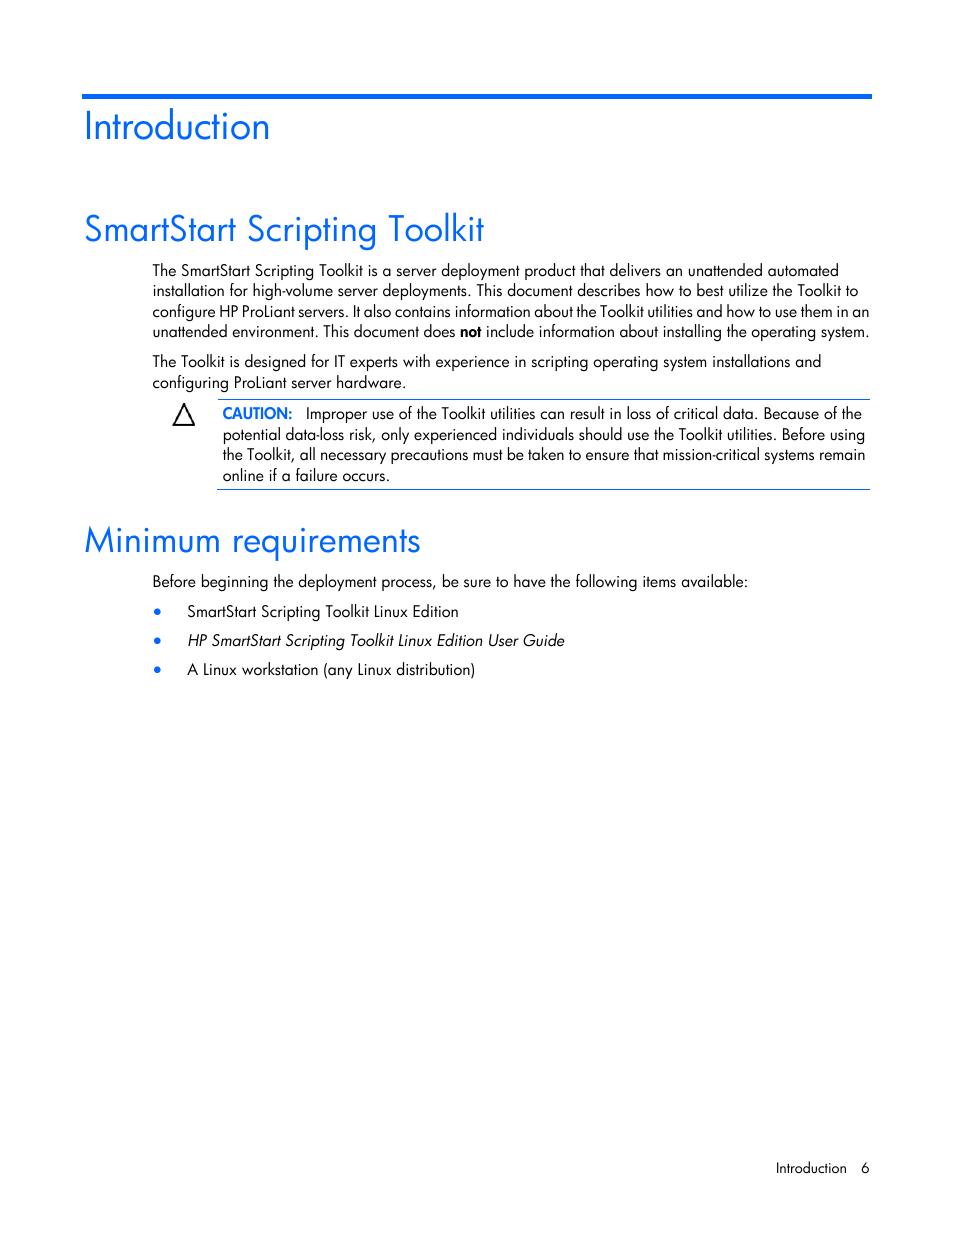 introduction smartstart scripting toolkit minimum requirements rh manualsdir com